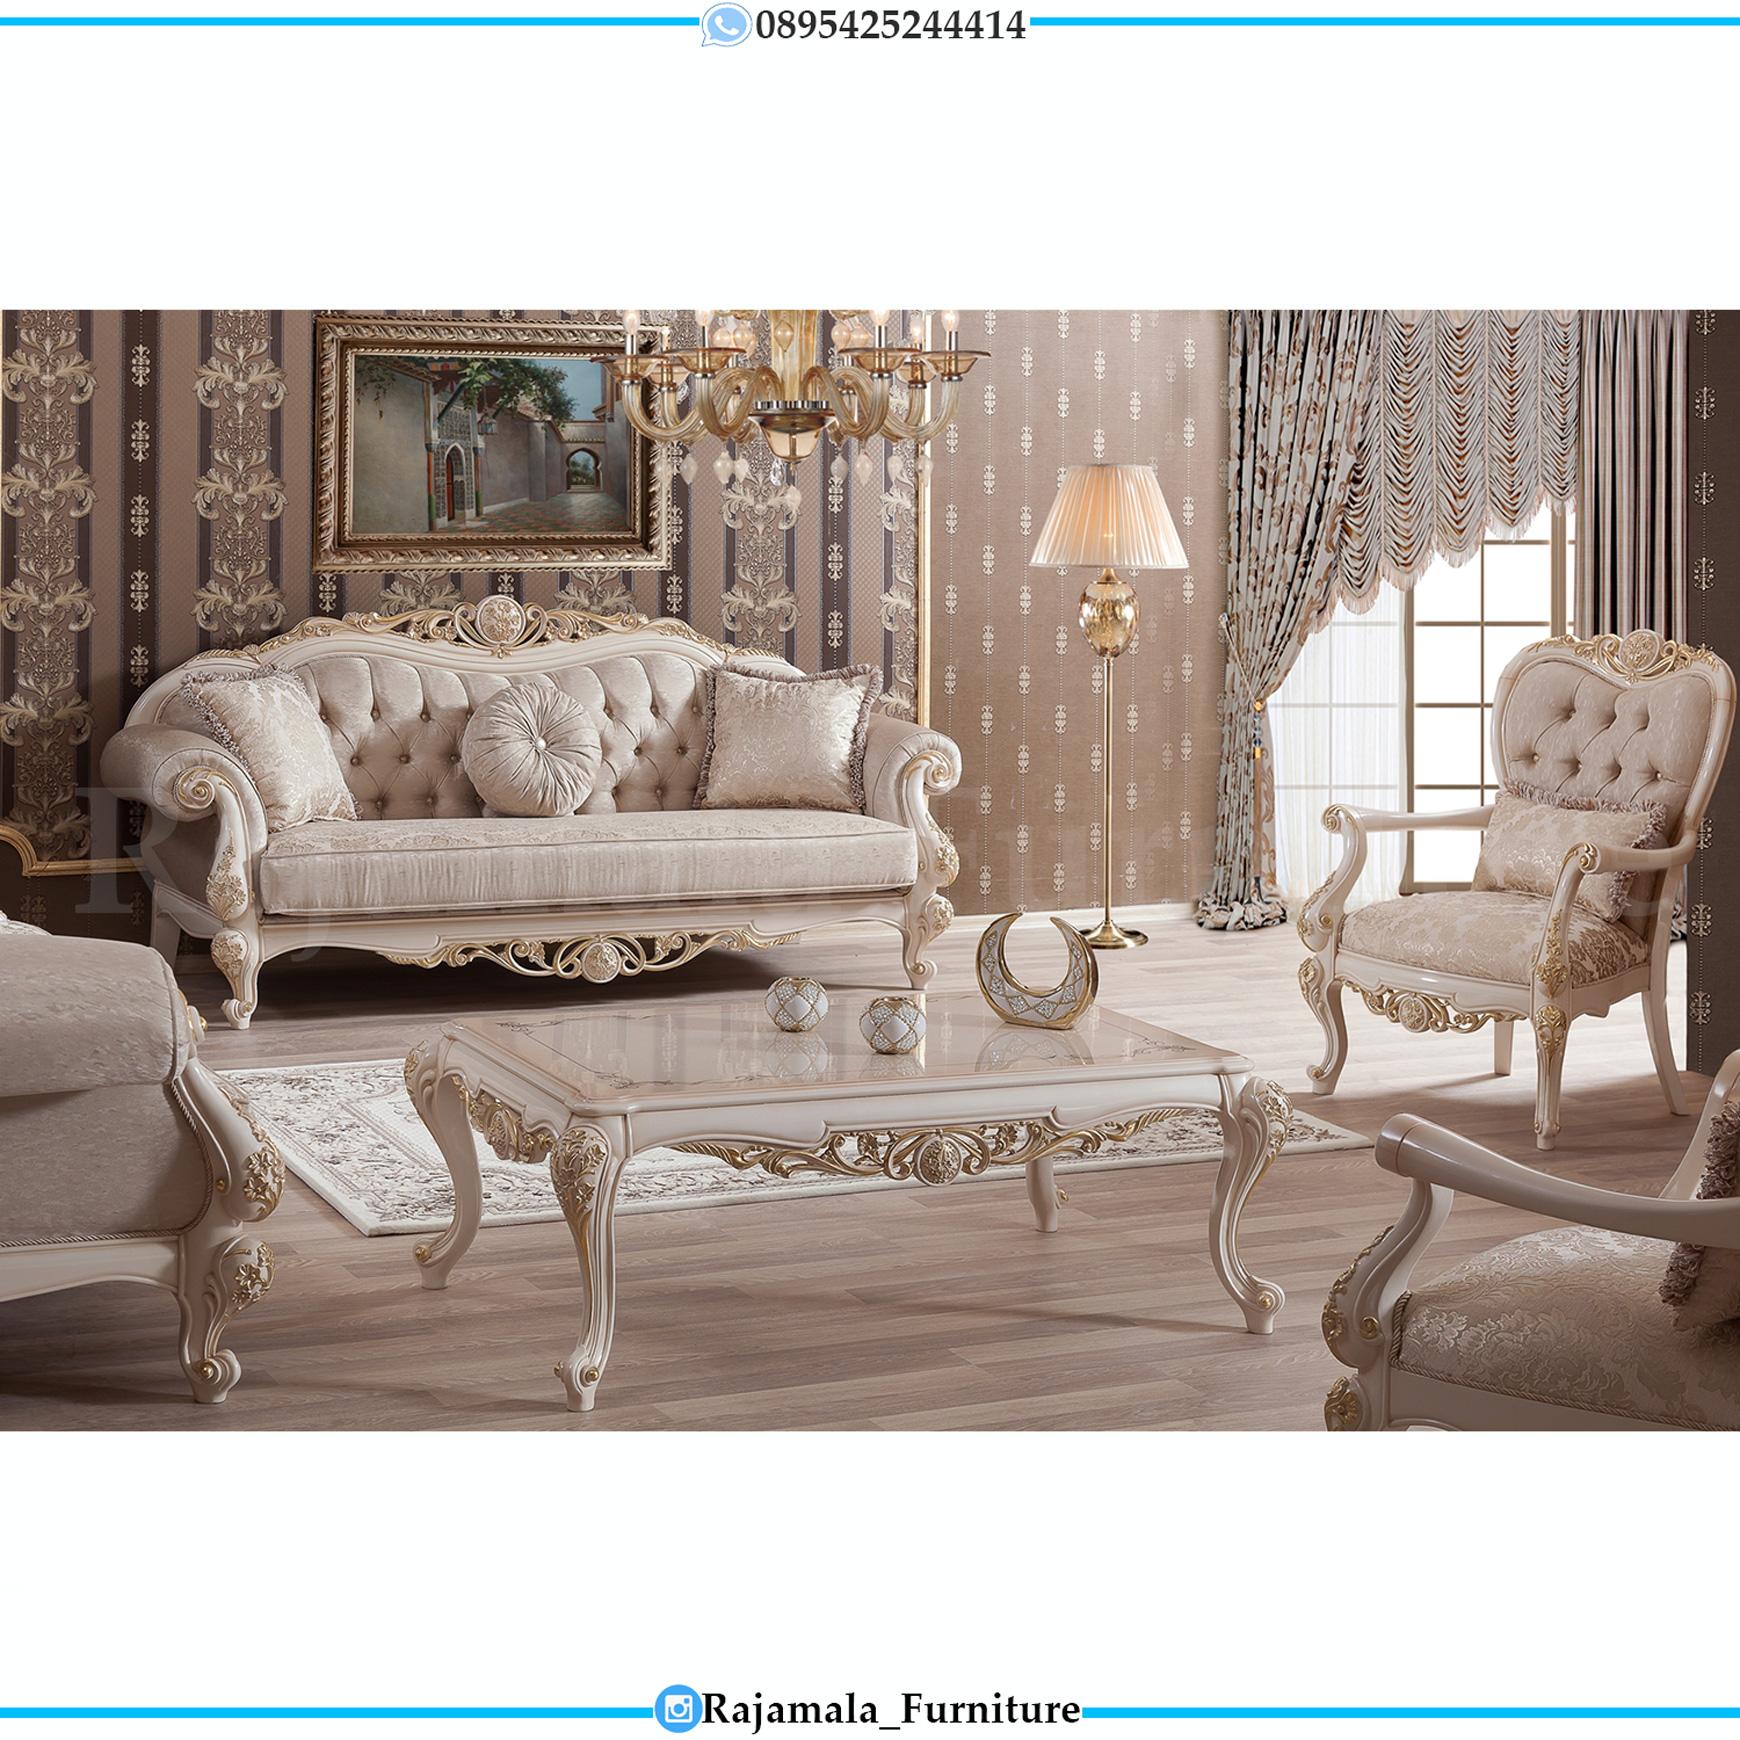 Desain Sofa Tamu Mewah Elegant Style Luxury Furniture Jepara RM-0143